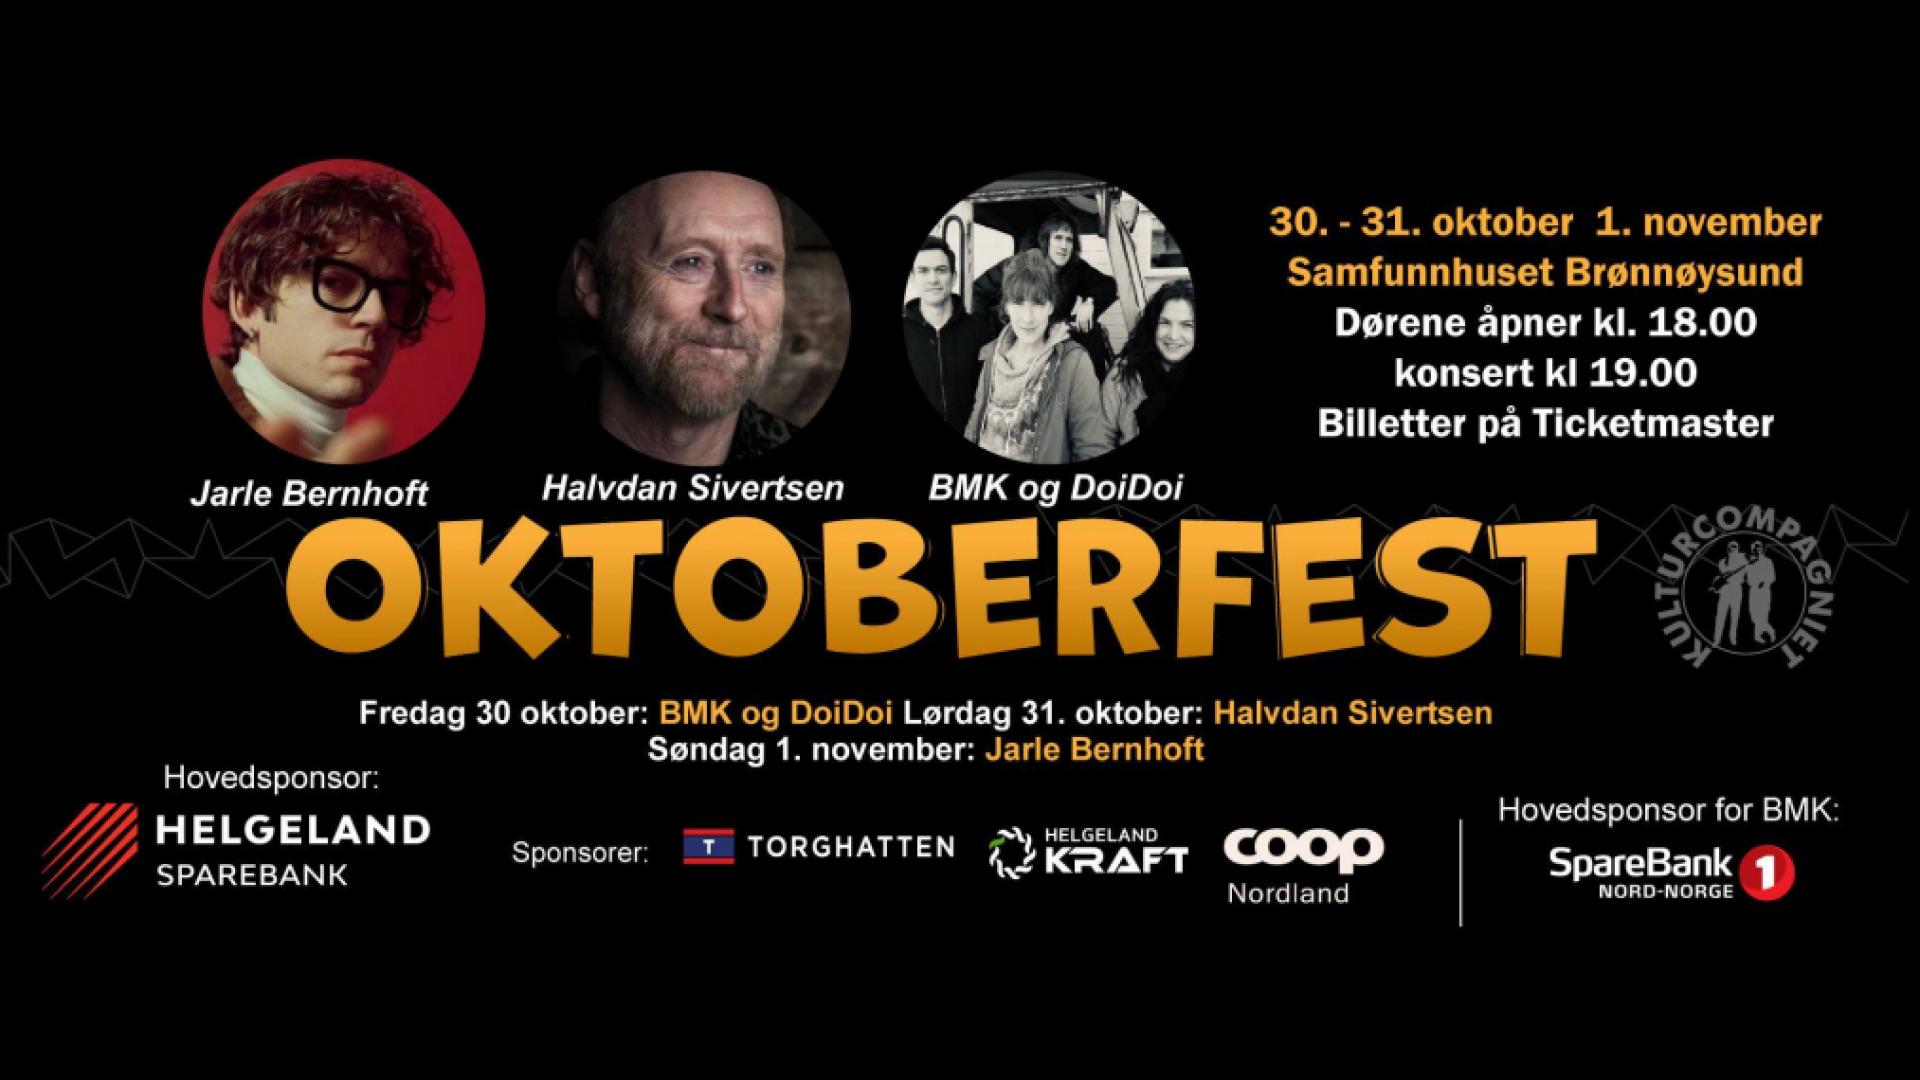 Plakat fpr oktoberfest